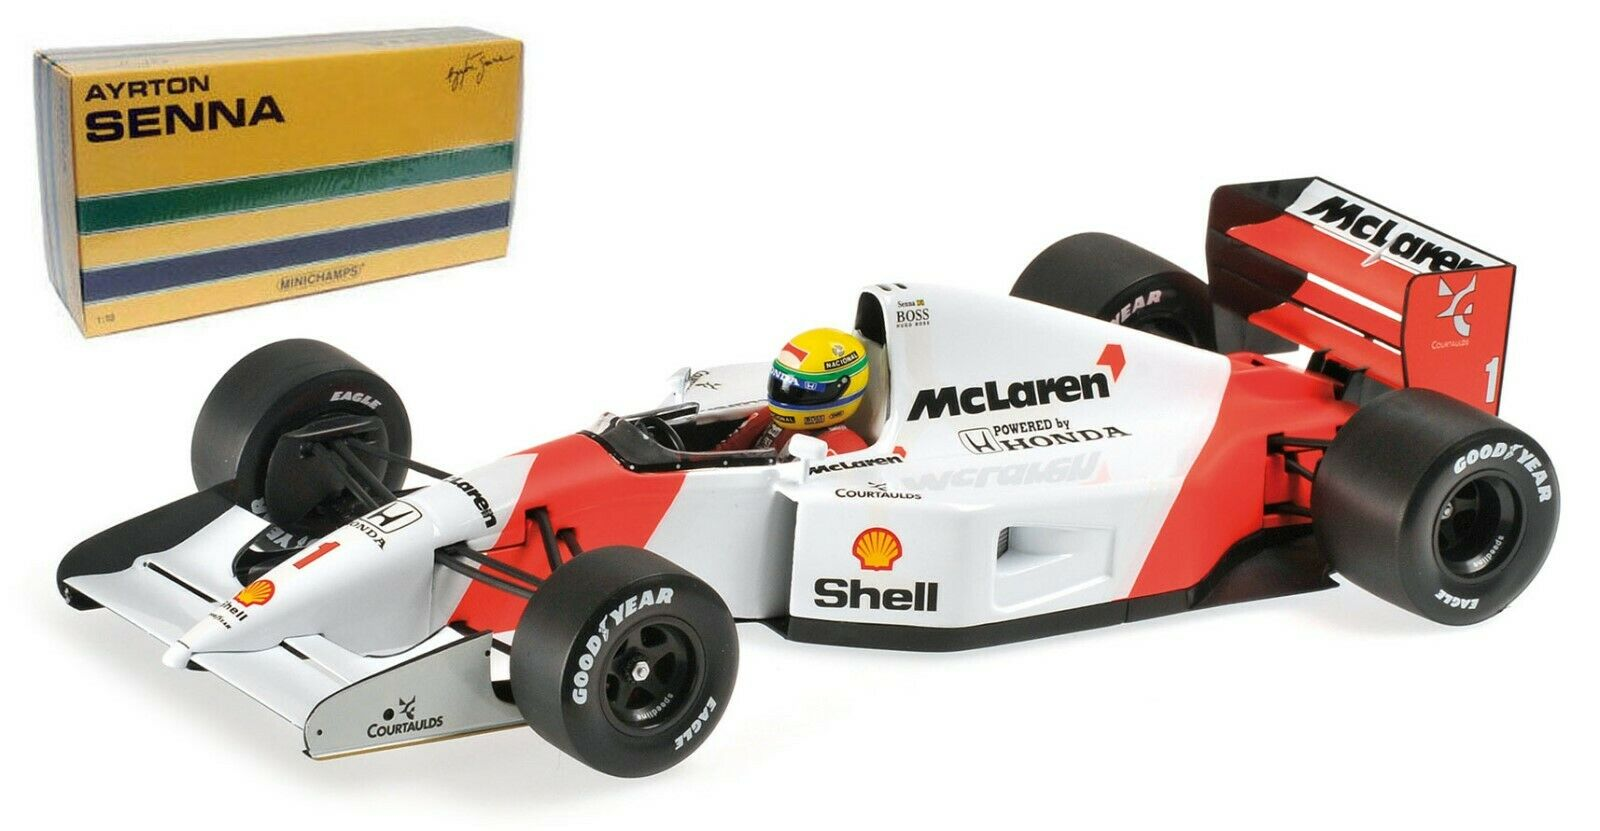 Minichamps McLaren Honda MP4 7 Ayrton Senna 1 18 Escala